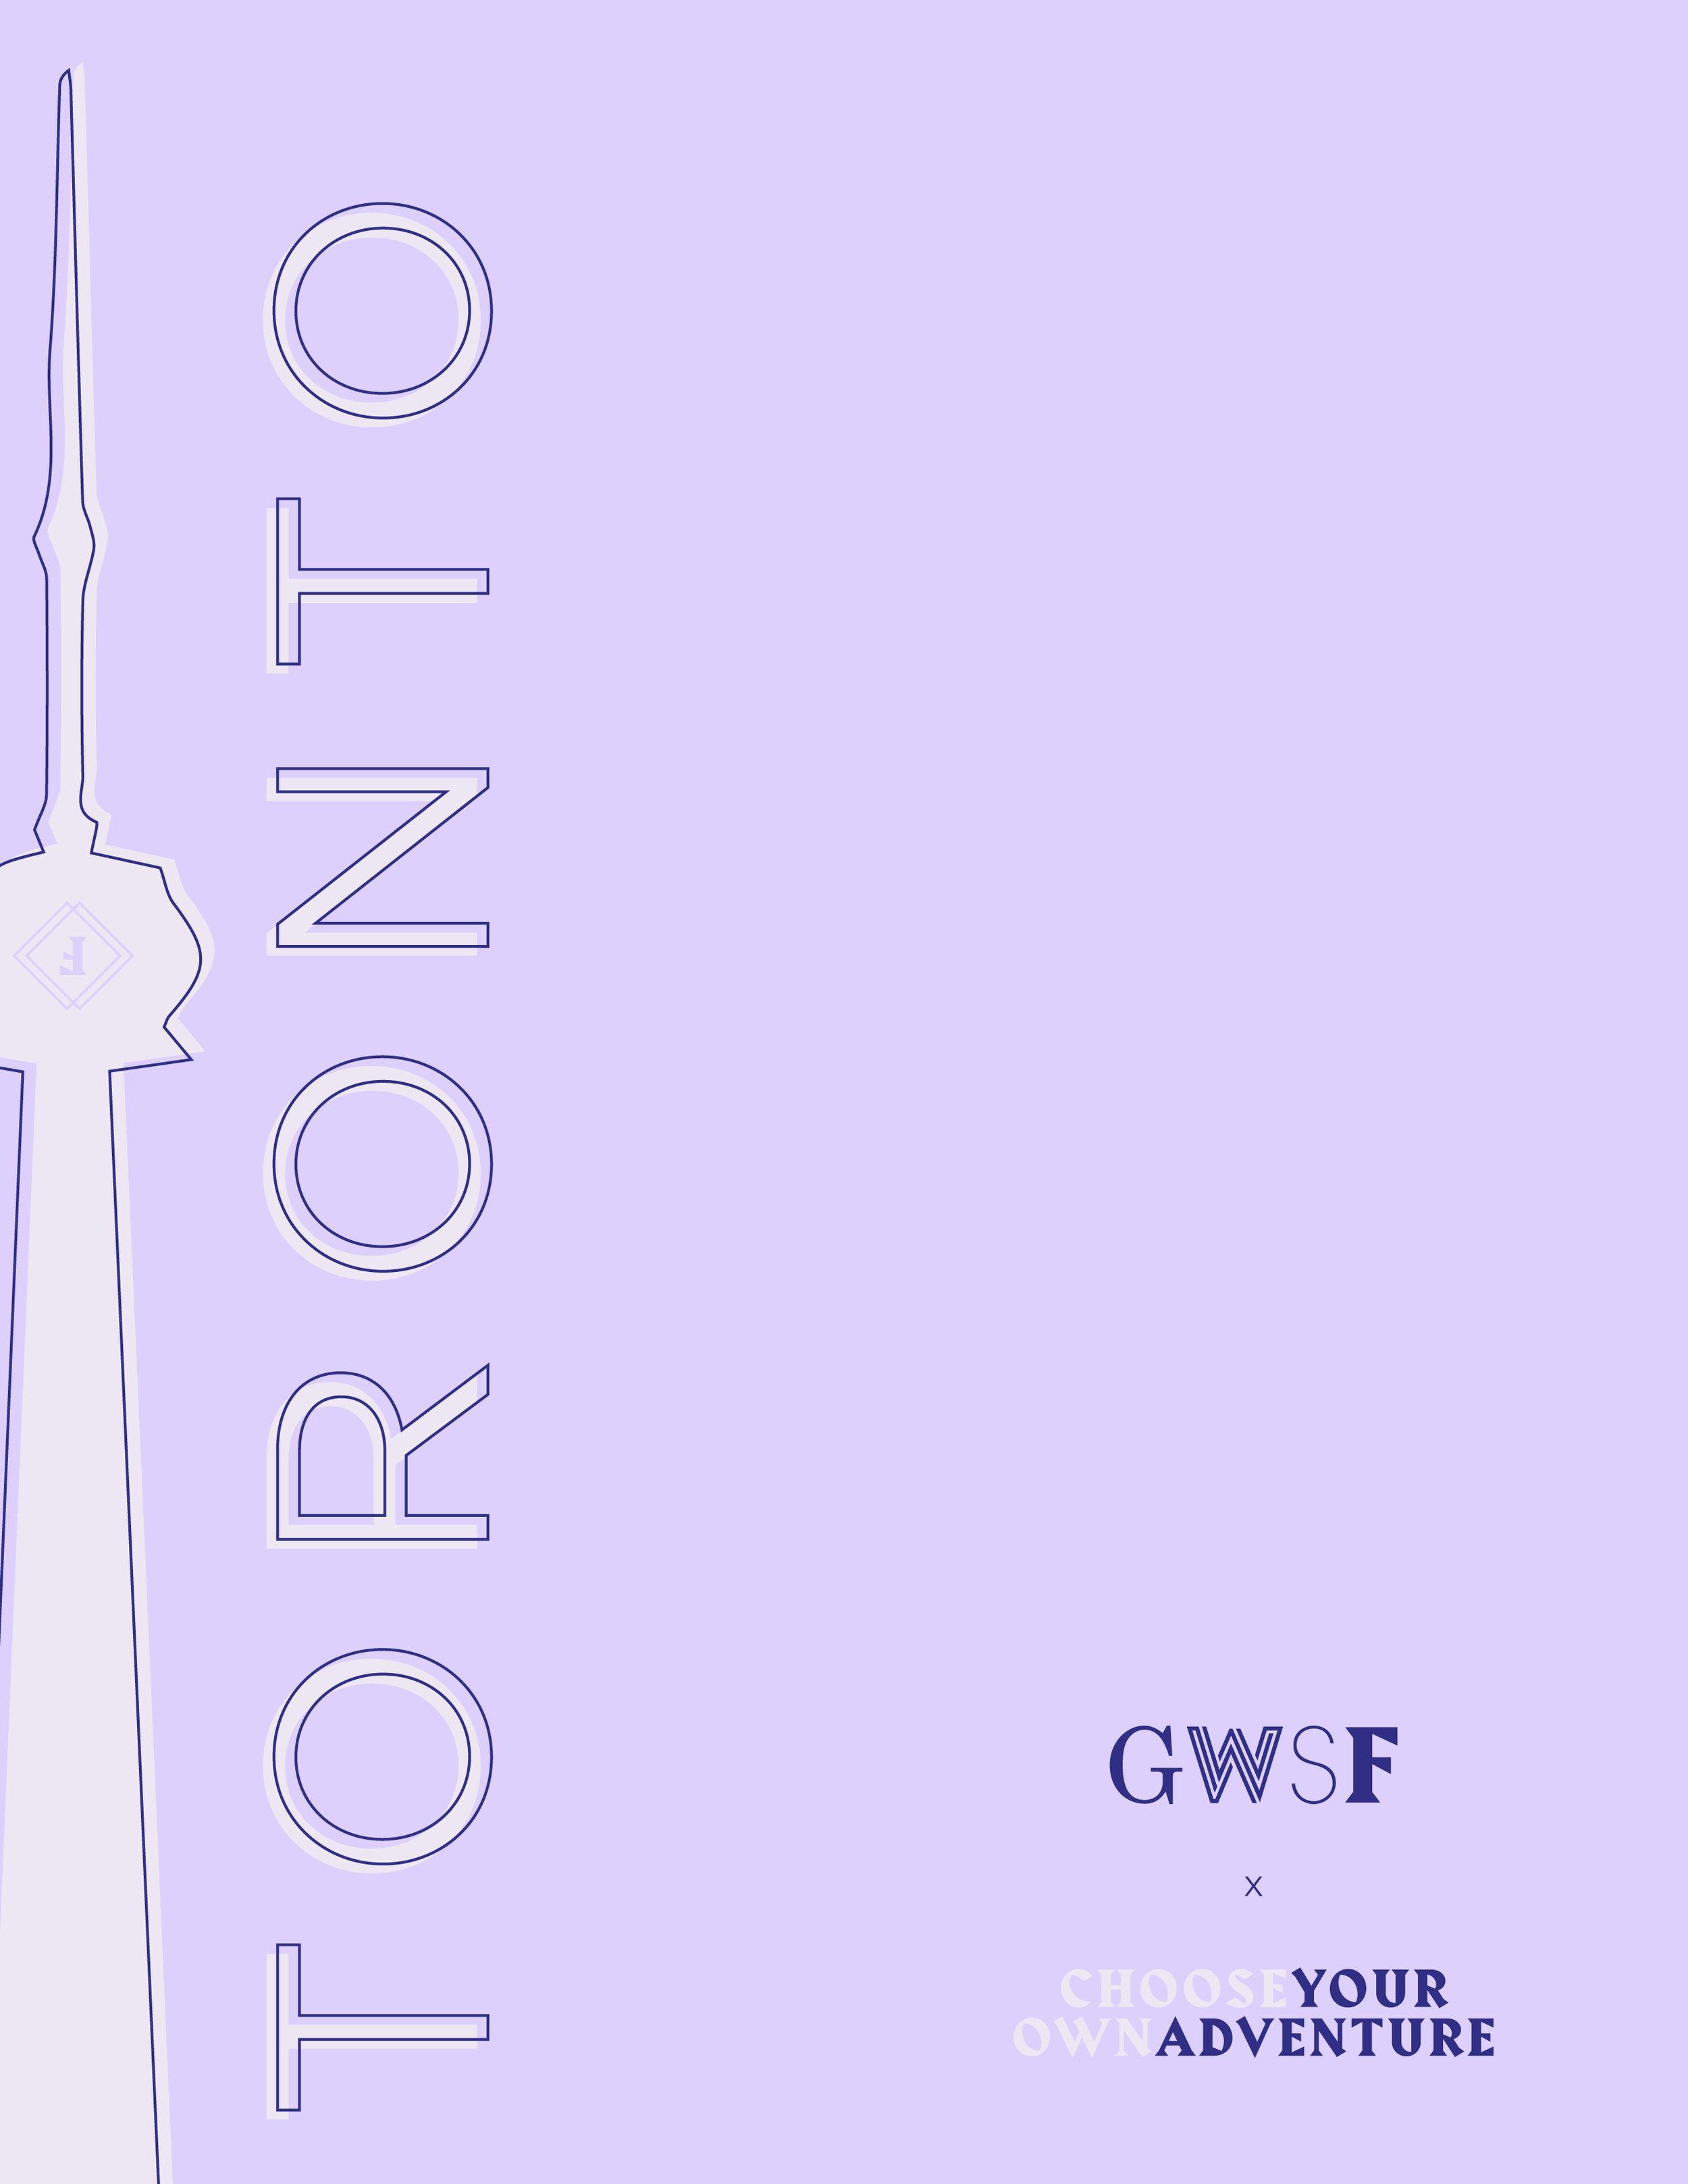 gwsf_itinerary_toronto_title-01.jpg